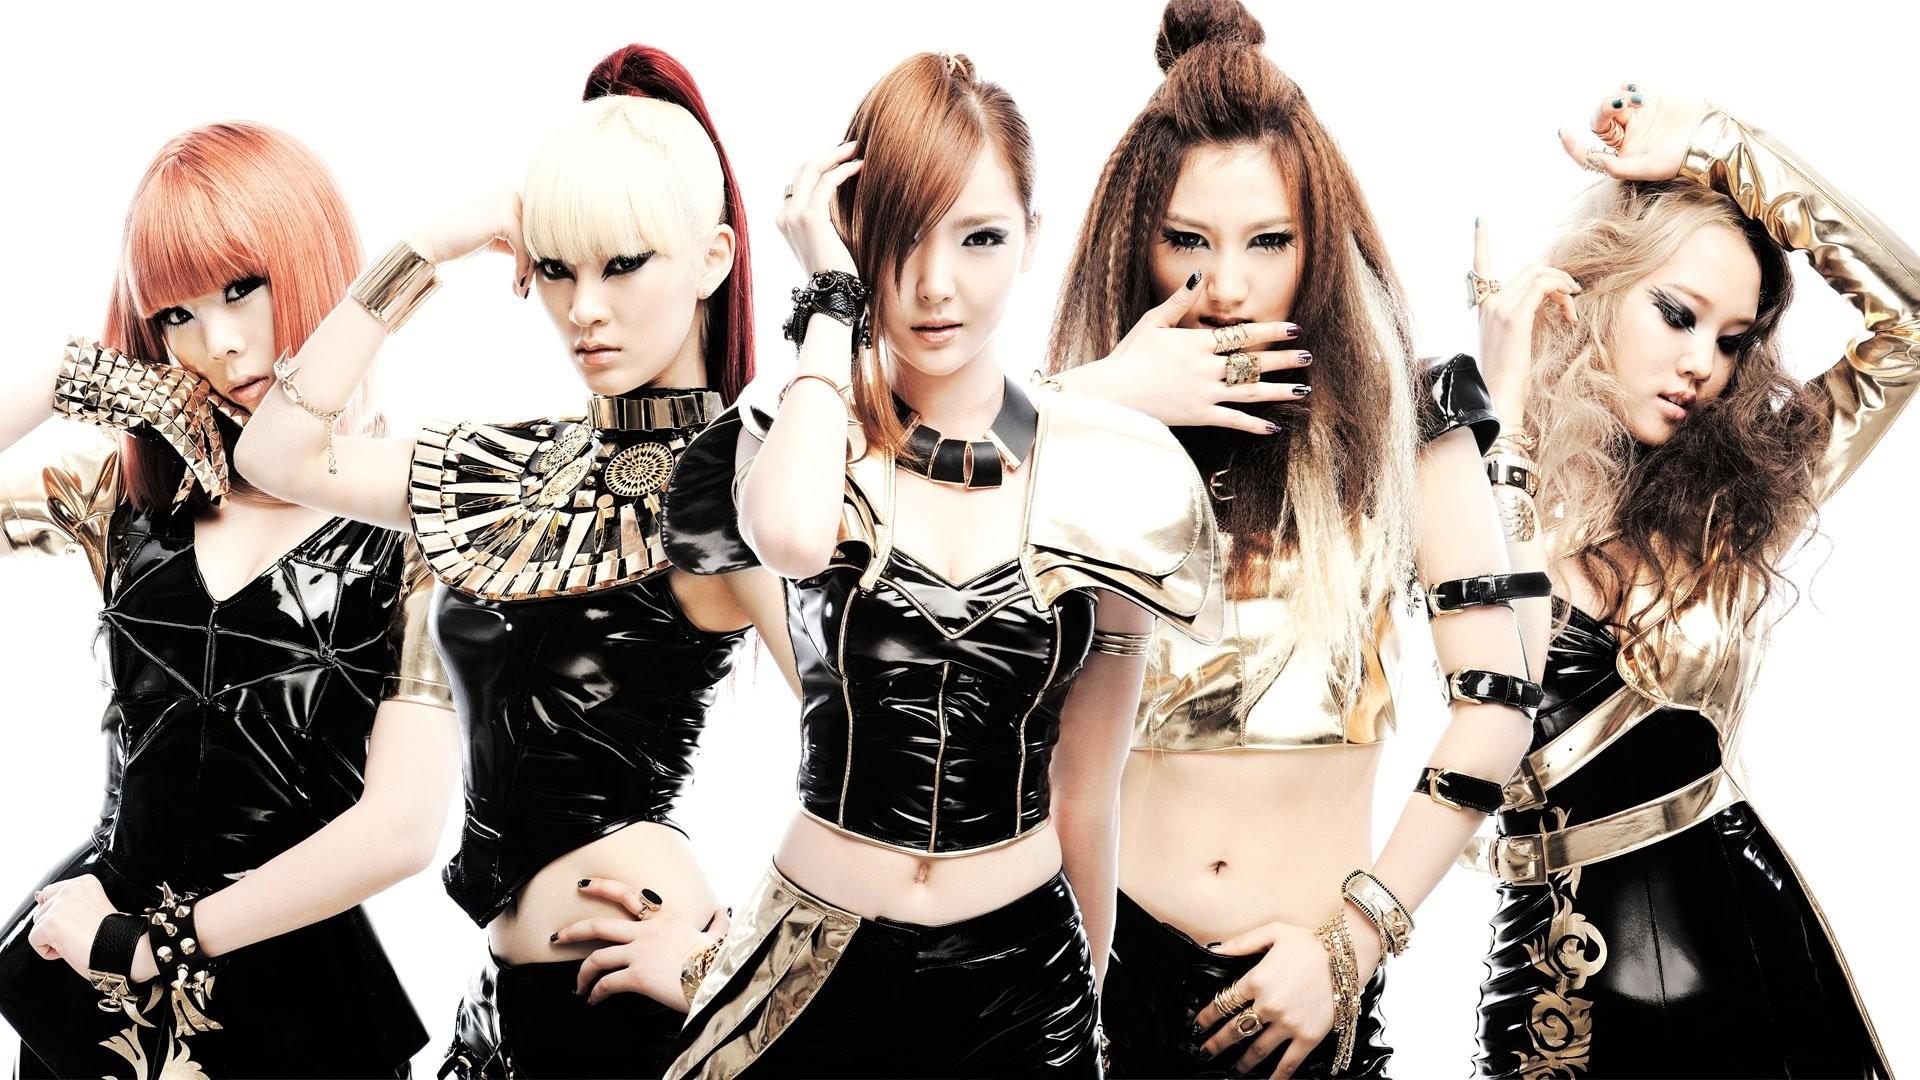 Kpop Nugu Girl Groups 83226 Hd Wallpaper Backgrounds